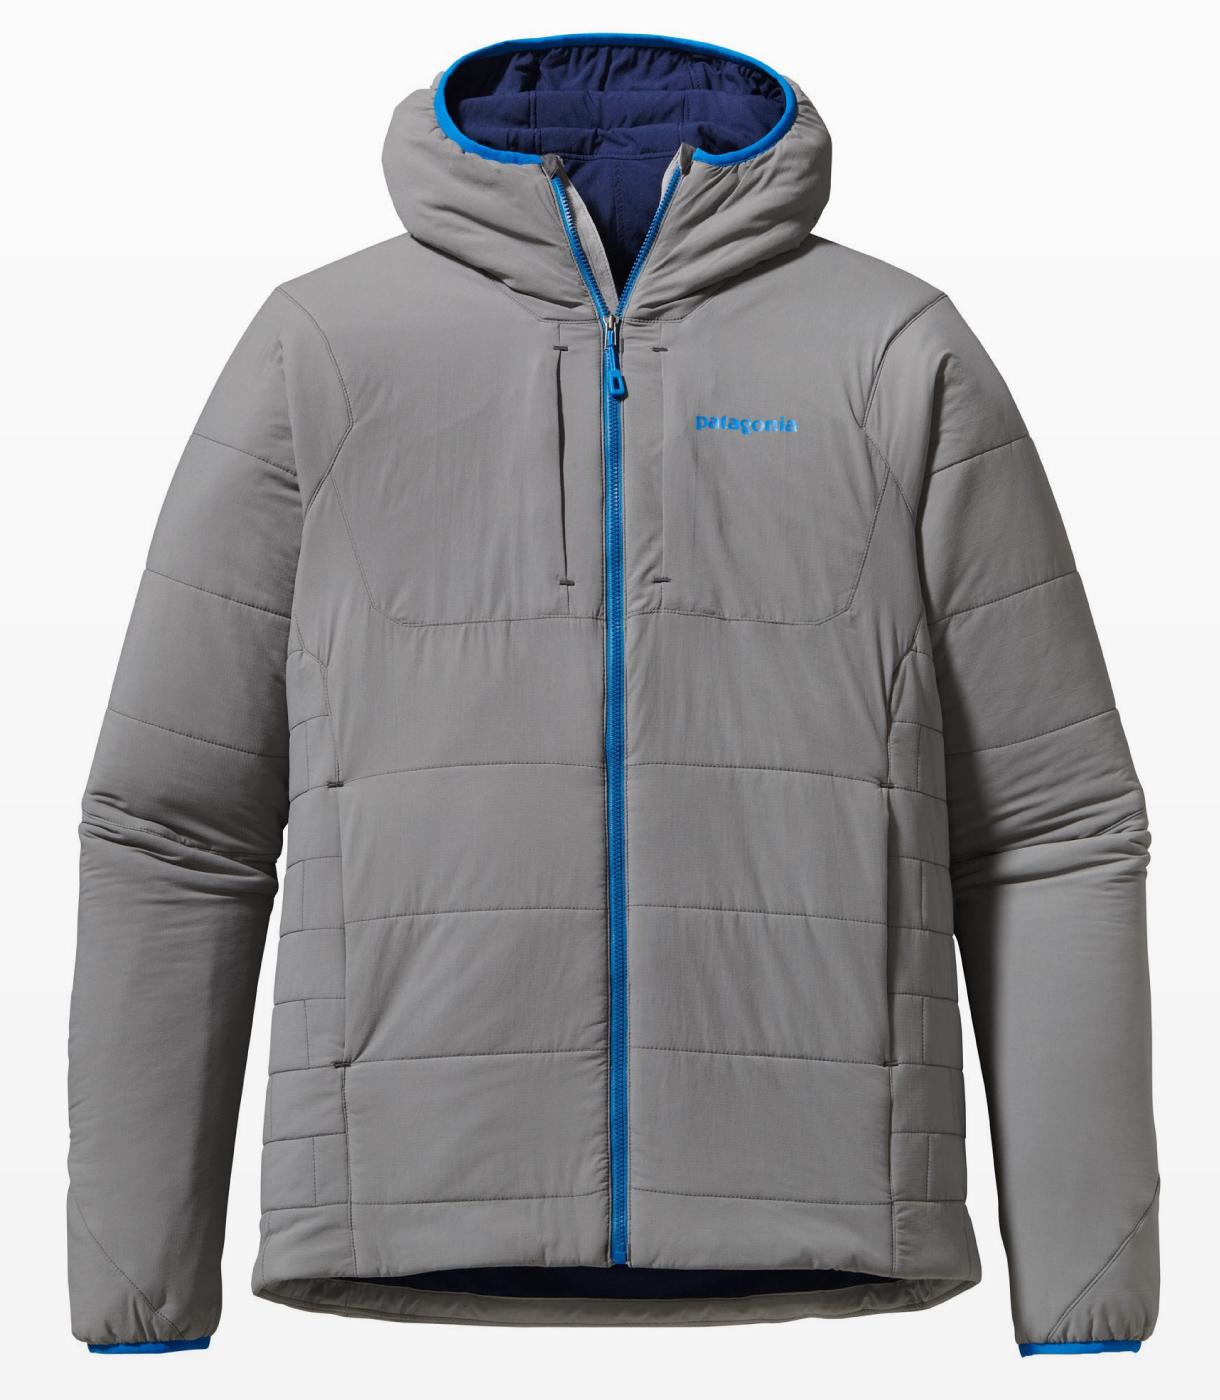 2014-gift-guide-him_article-img-patagonia-jacket.jpg